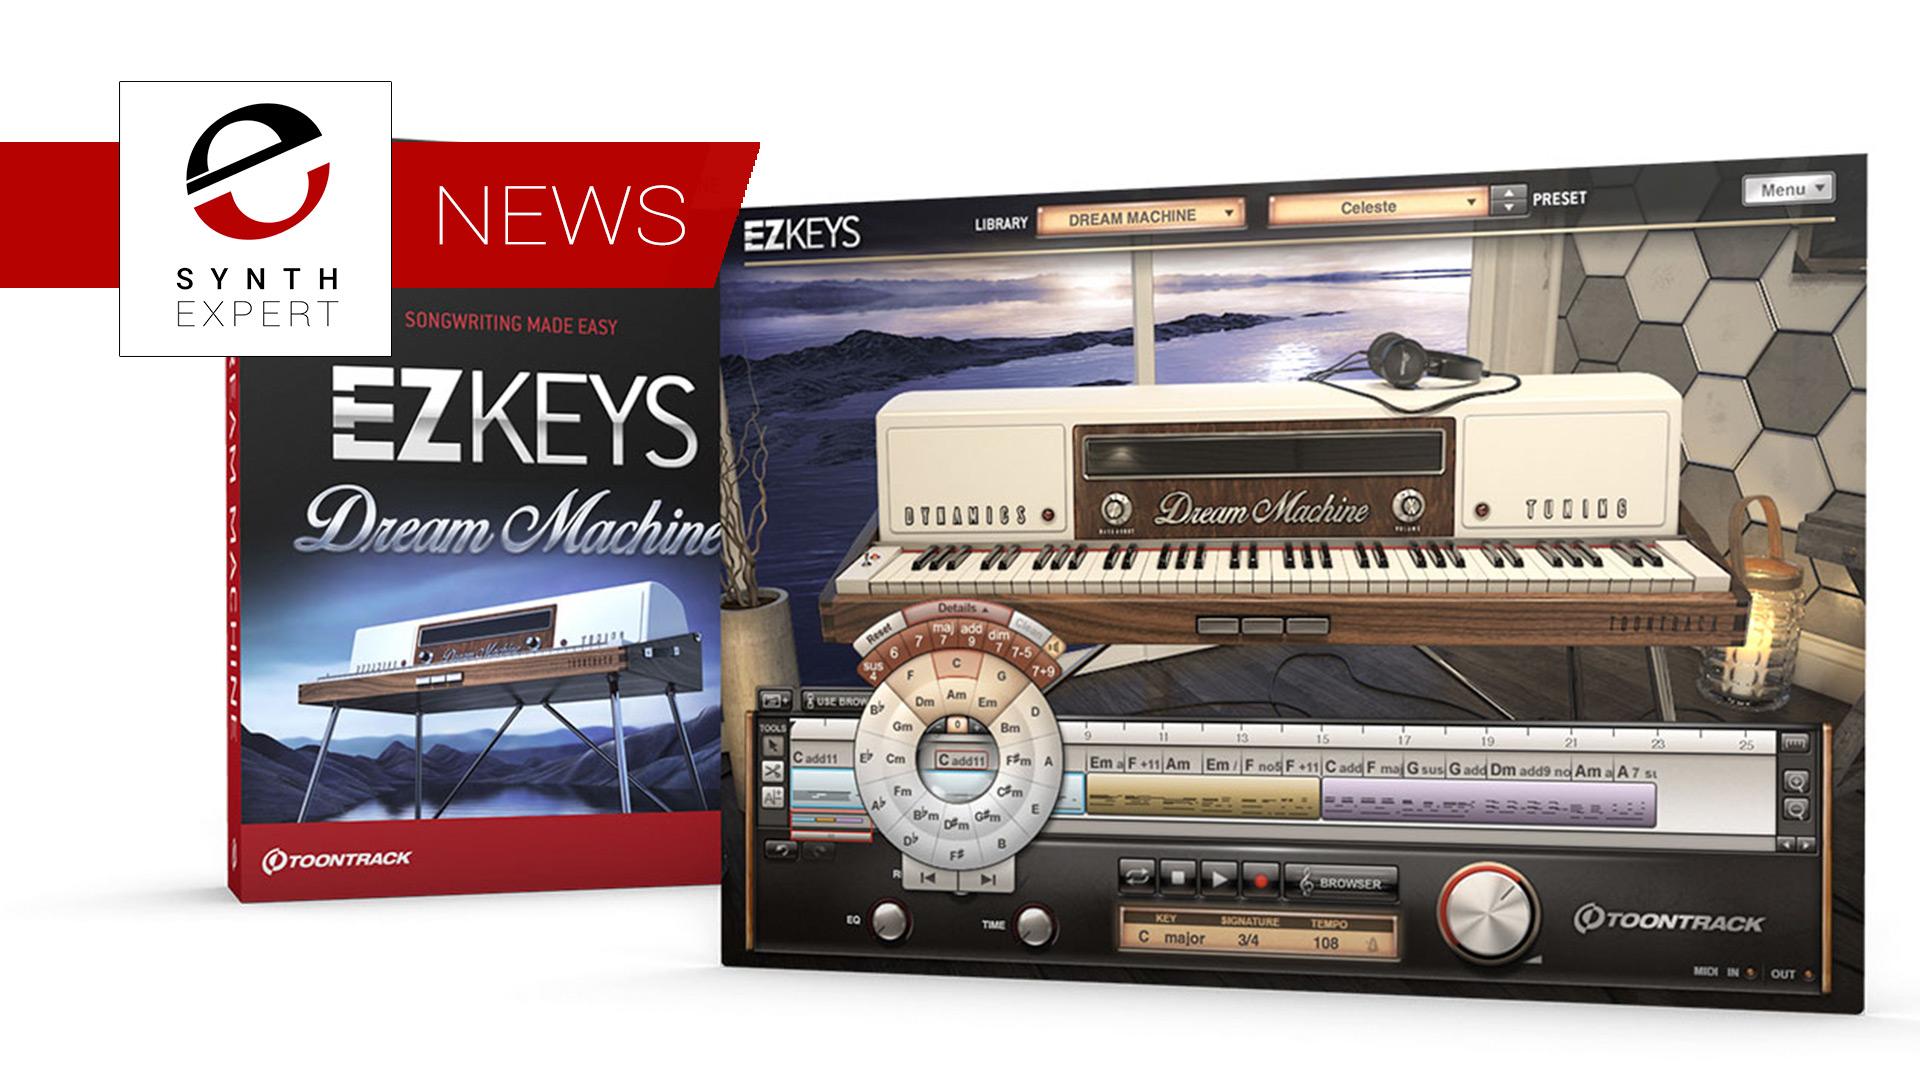 news-toontrack-release-dream-machine-ezkeys-keyboard-instrument.jpg